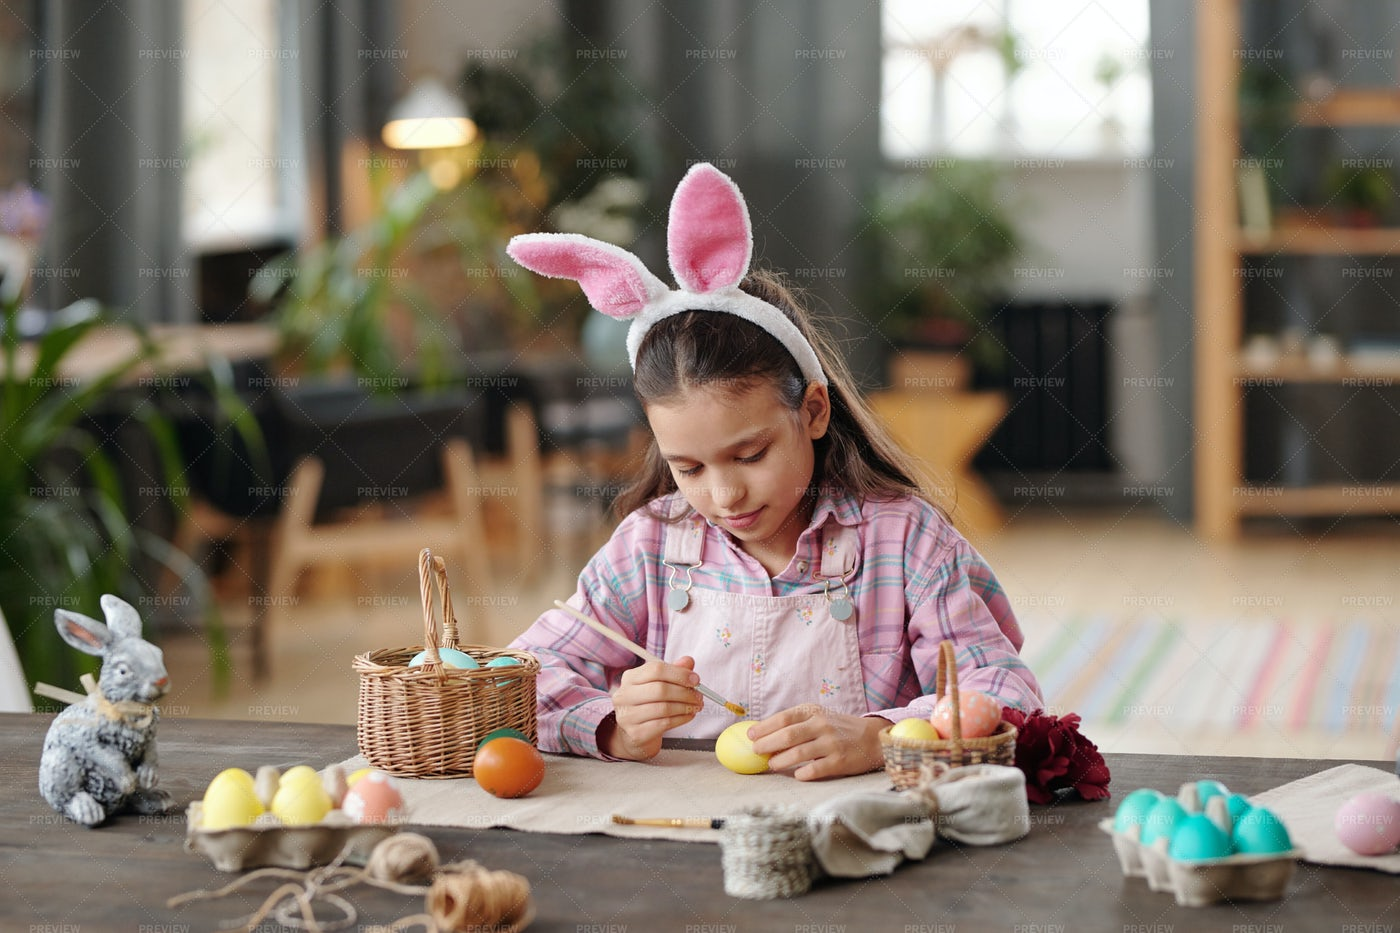 Little Girl Painting Easter Eggs: Stock Photos